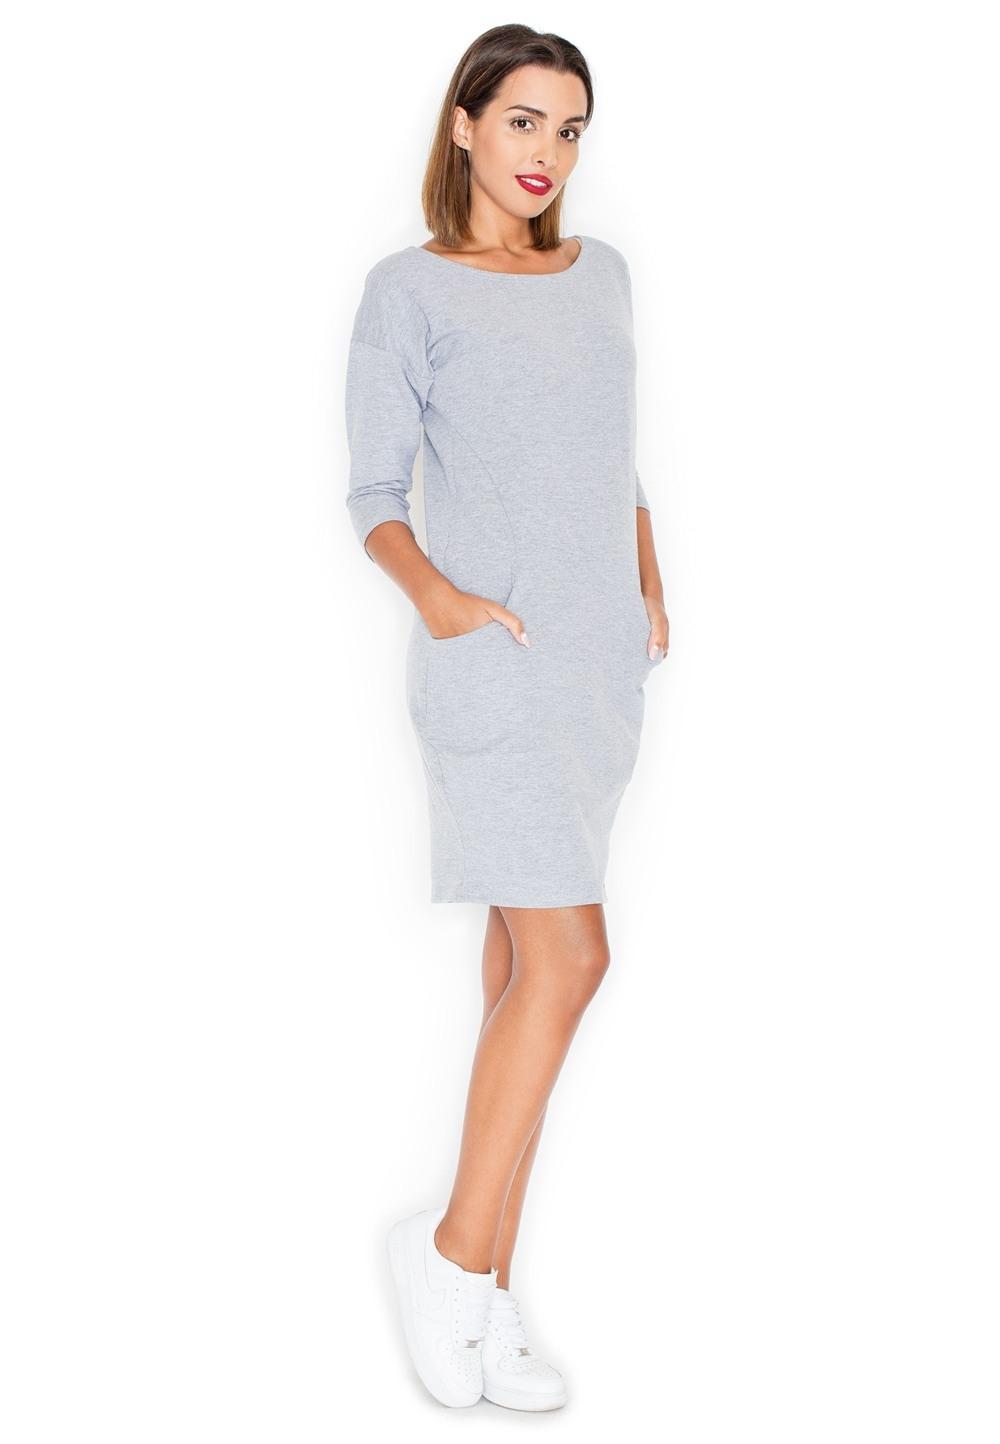 20 Leicht Kleid Grau ÄrmelAbend Leicht Kleid Grau Bester Preis